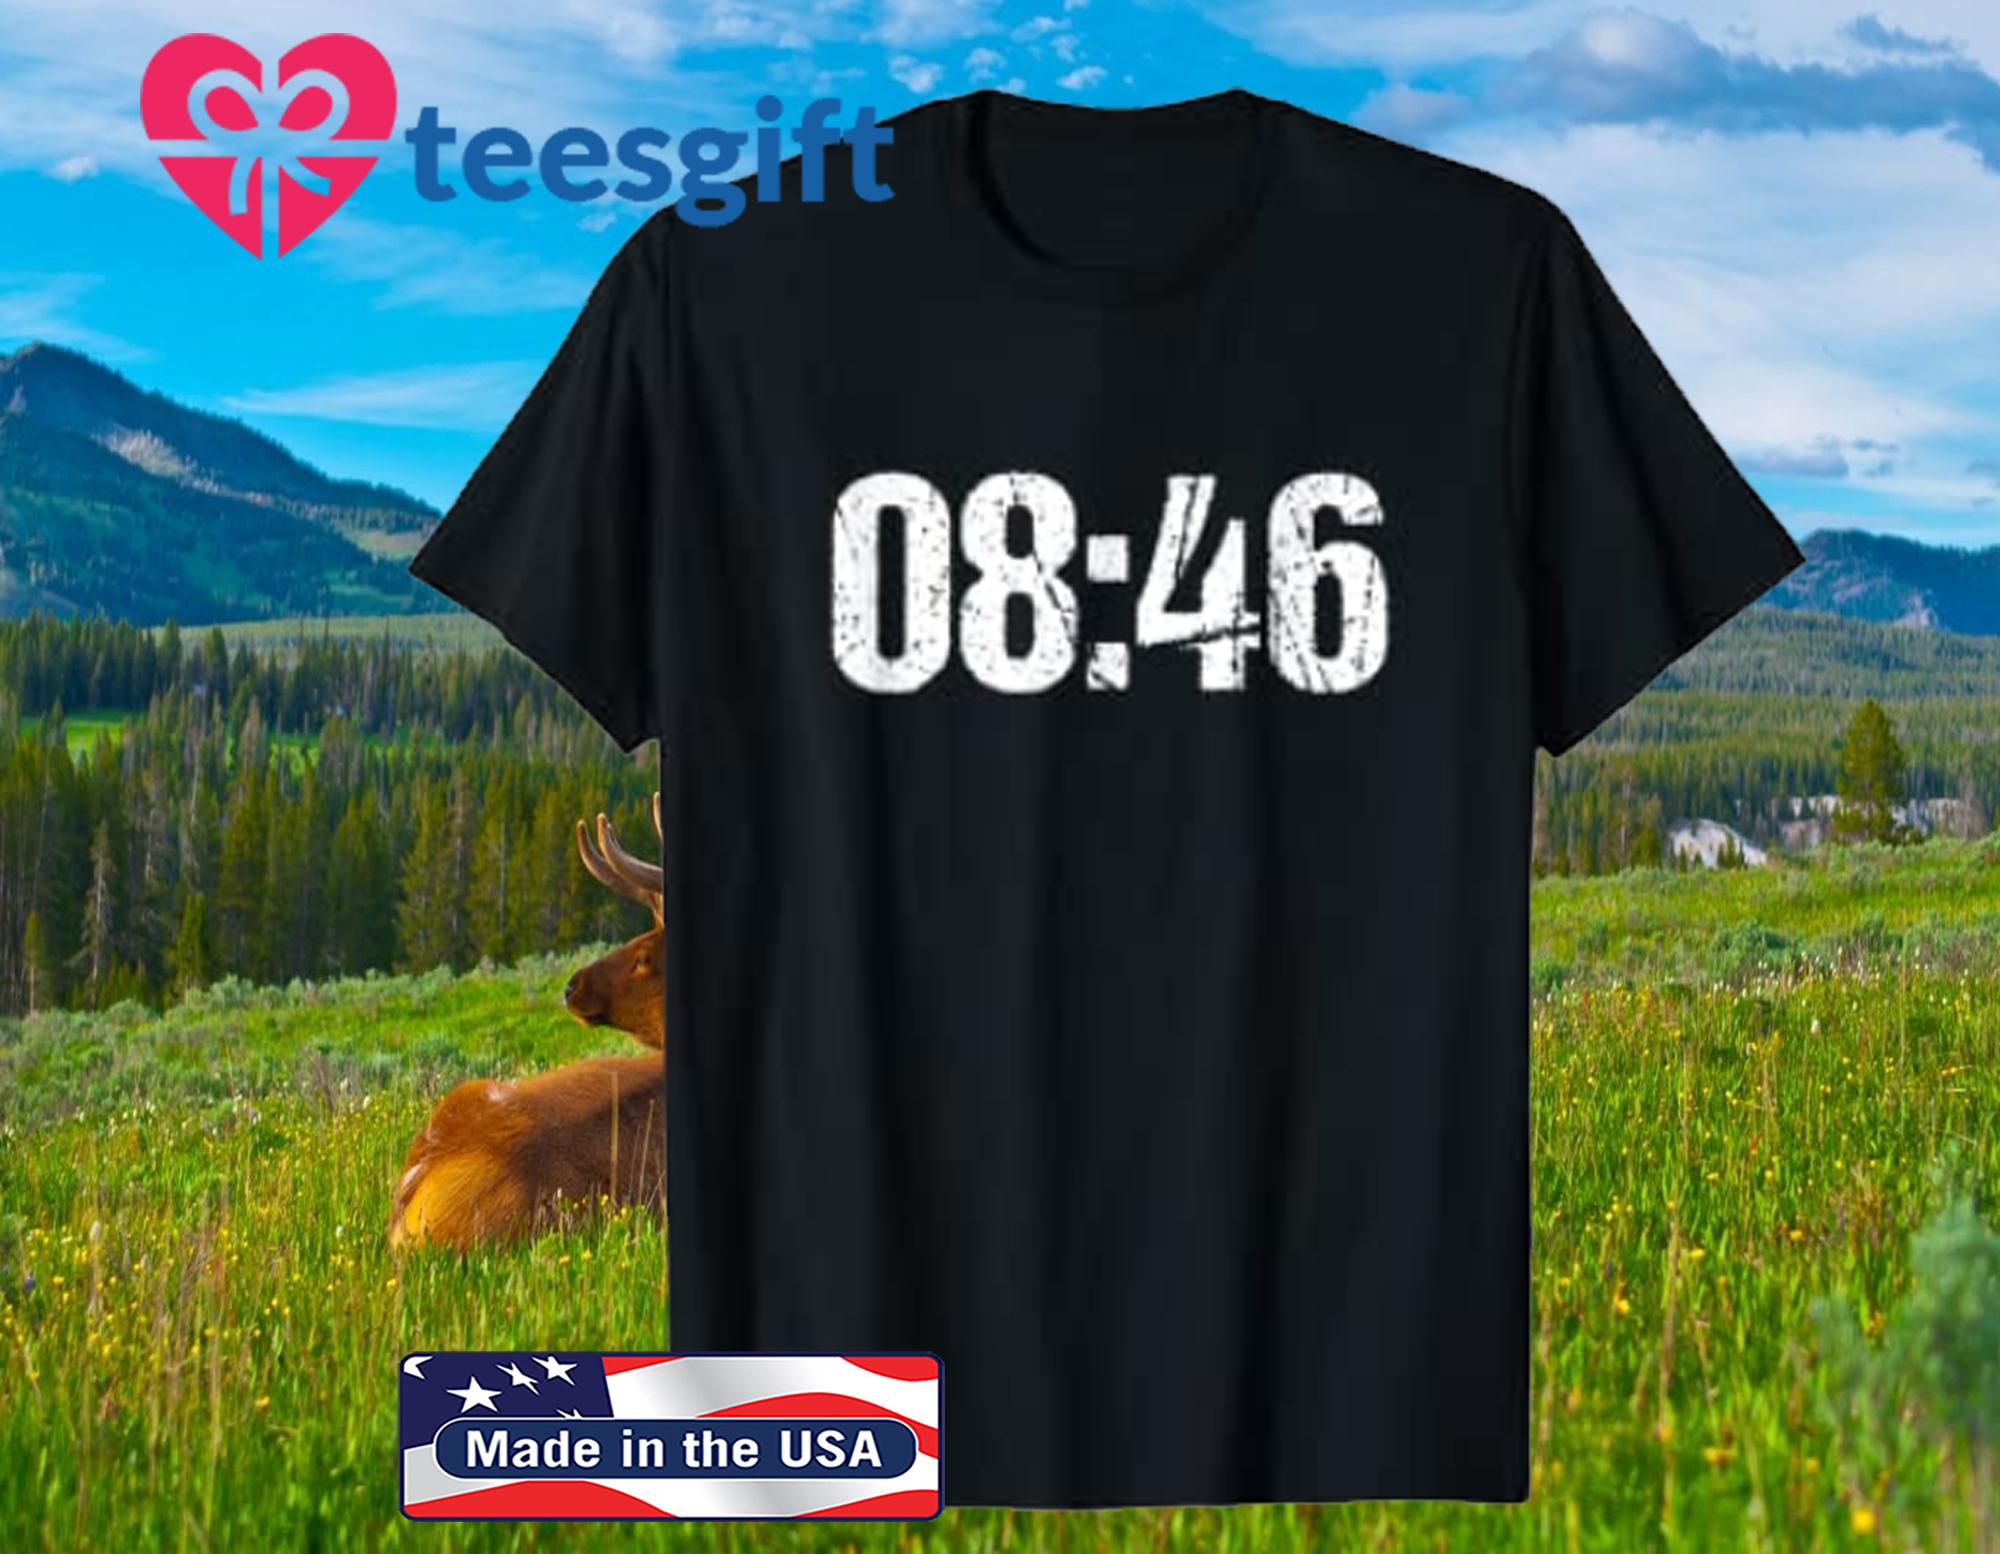 08:46 BLM Protest 2020 T-Shirt